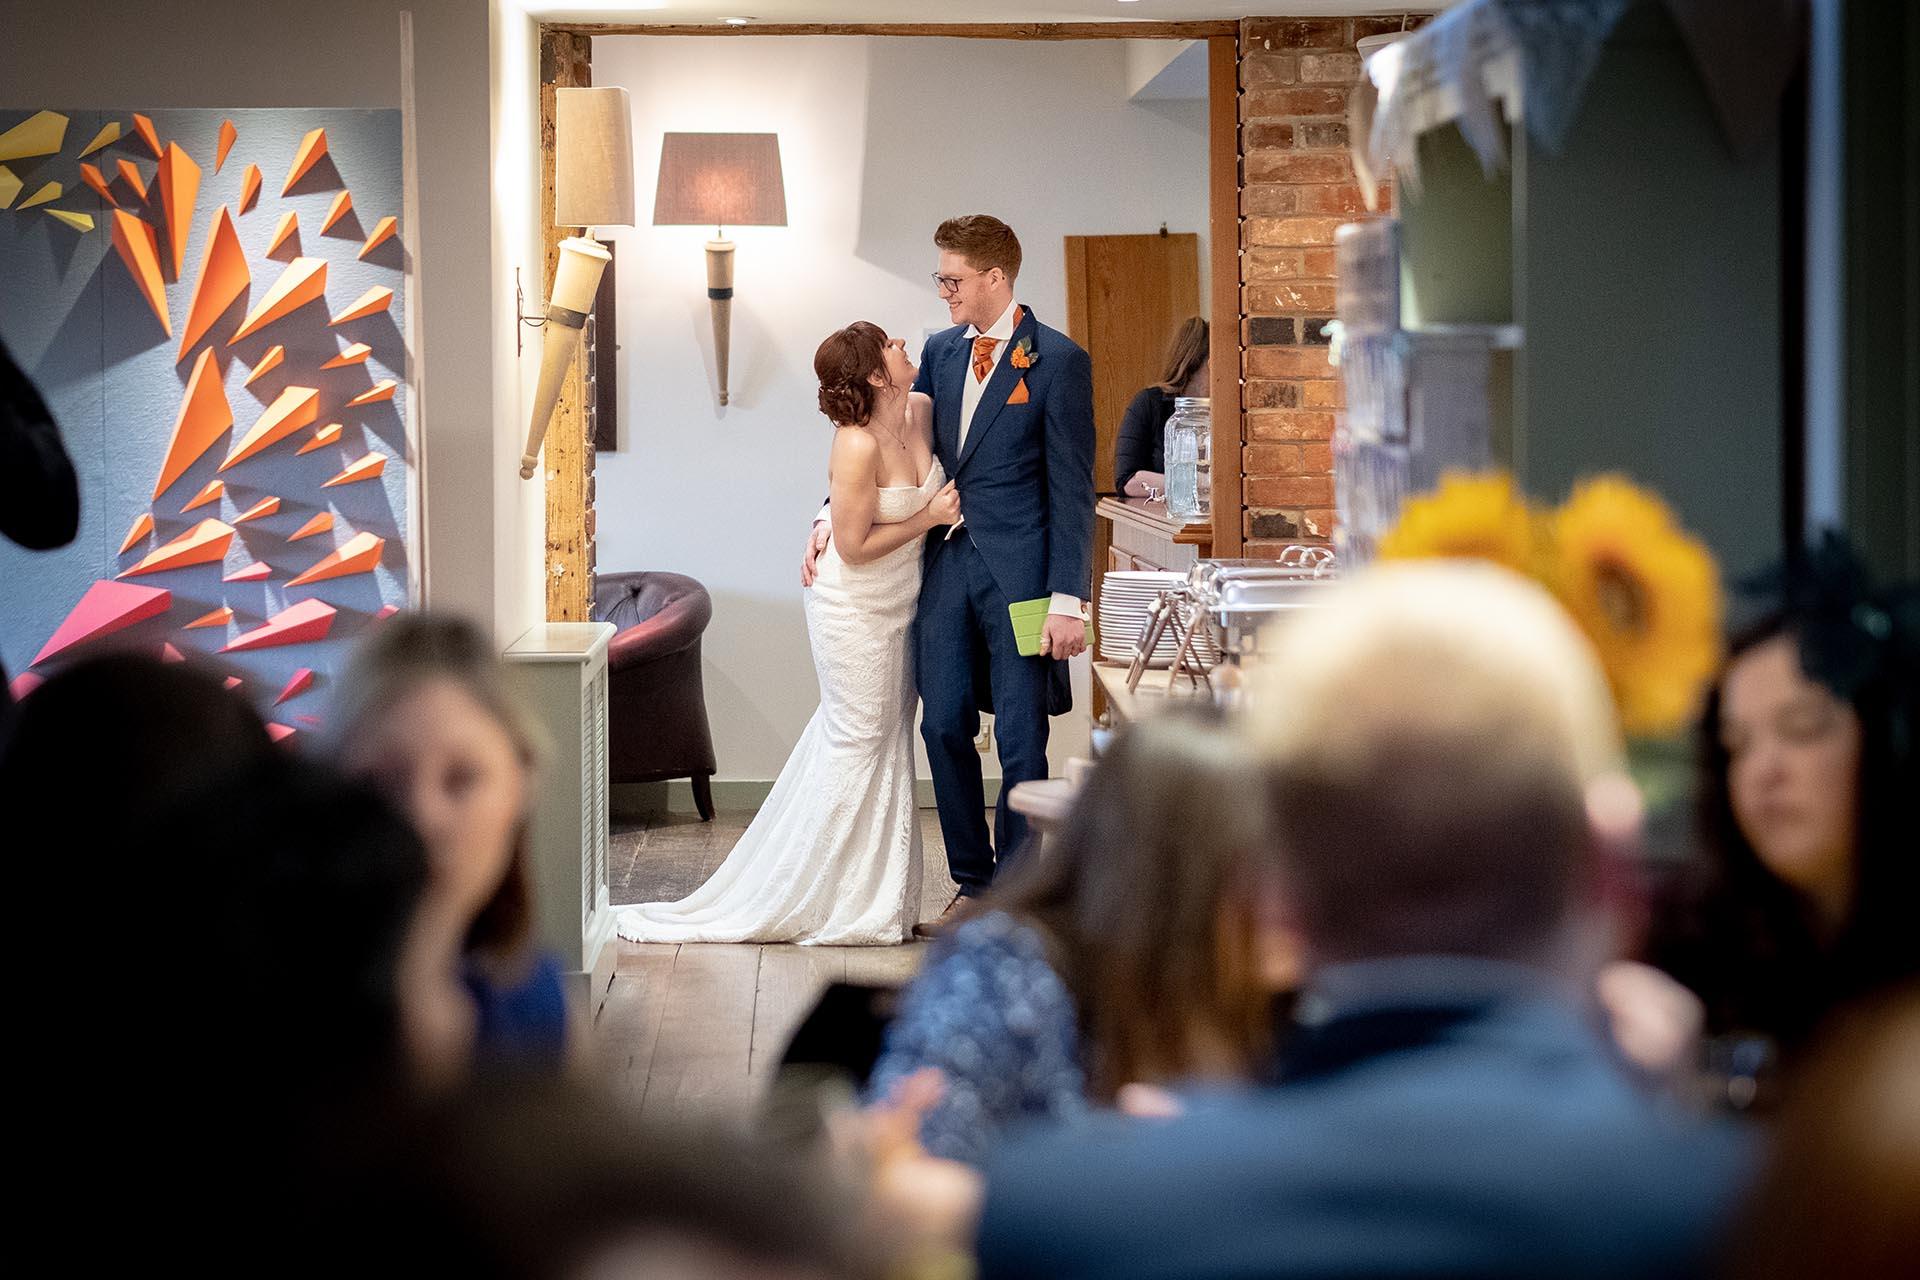 Reportage wedding photography